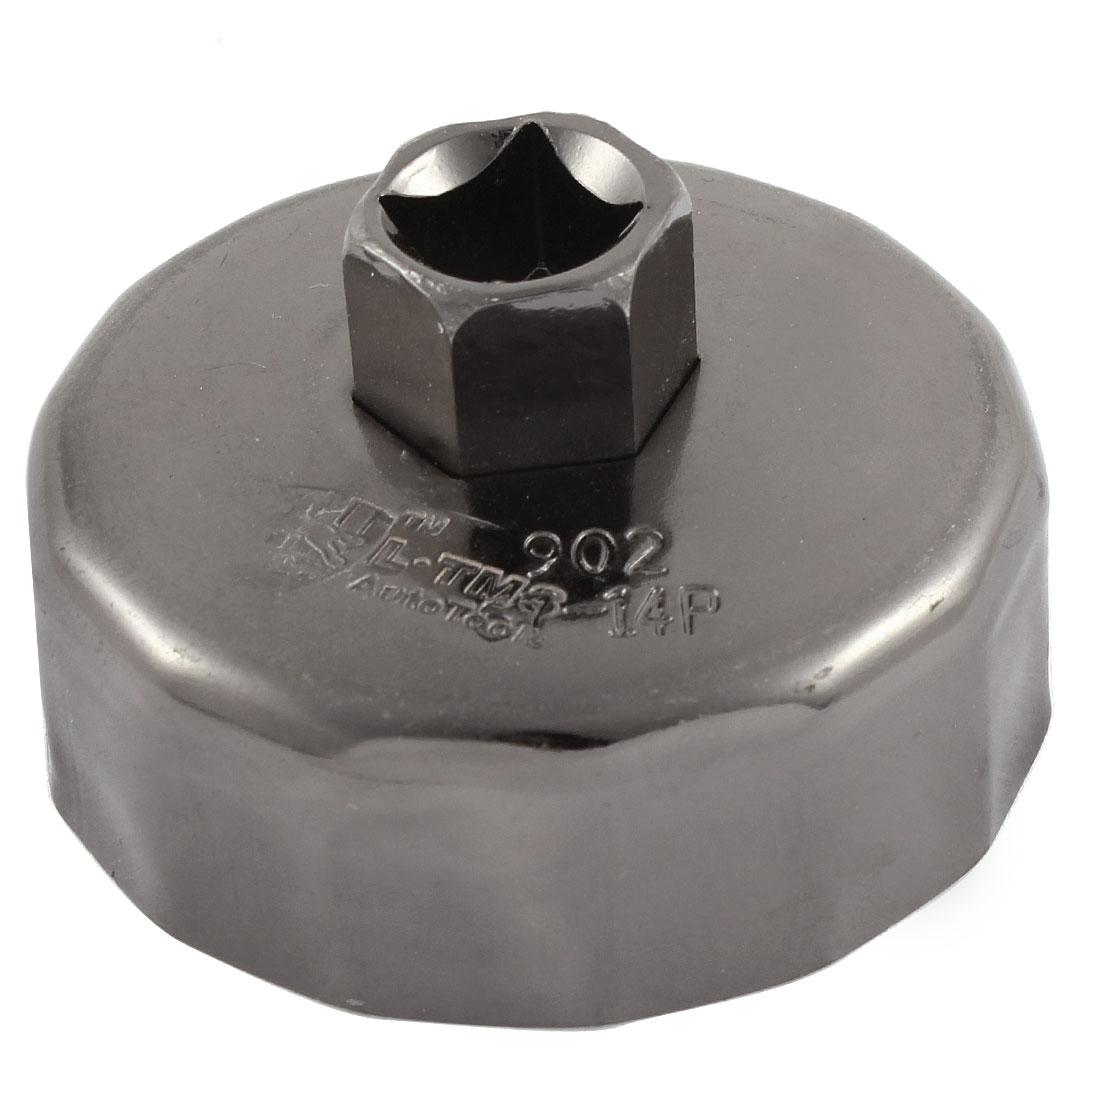 Car Vehicle Black Metal Oil Filter Cap Wrench Socket Cup Tool 68mm Inner Dia